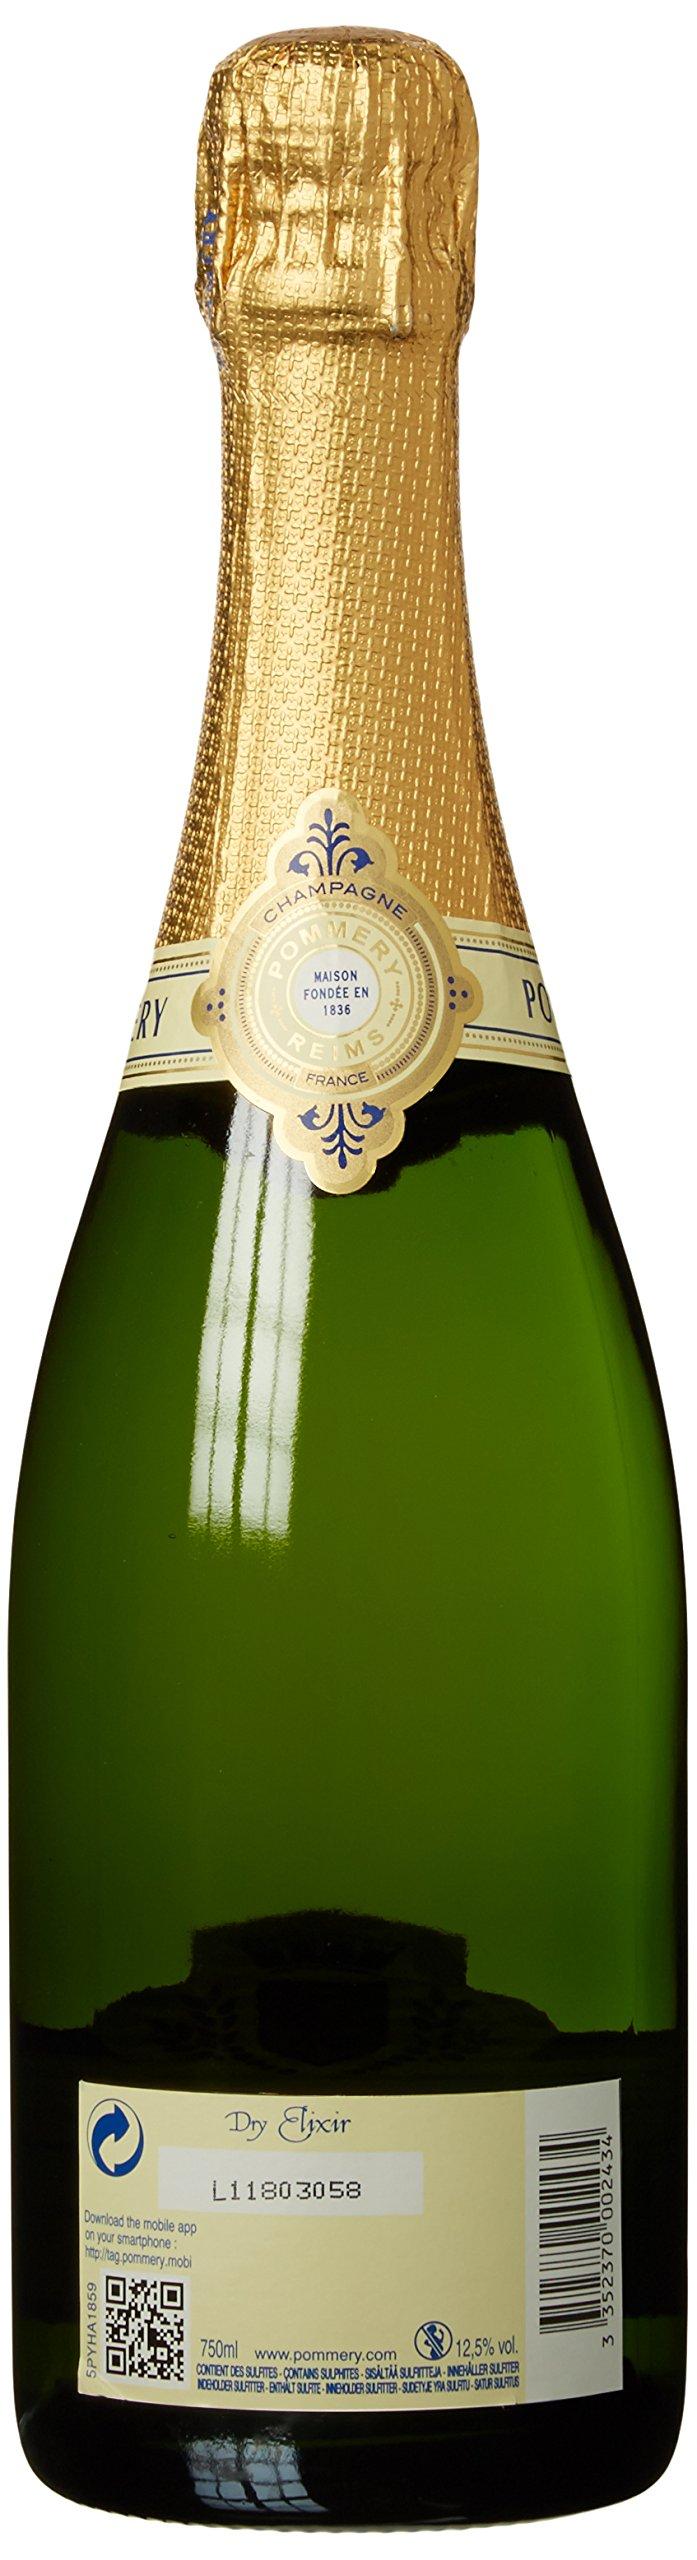 Champagne-Pommery-Dry-Elixir-1-x-075-l